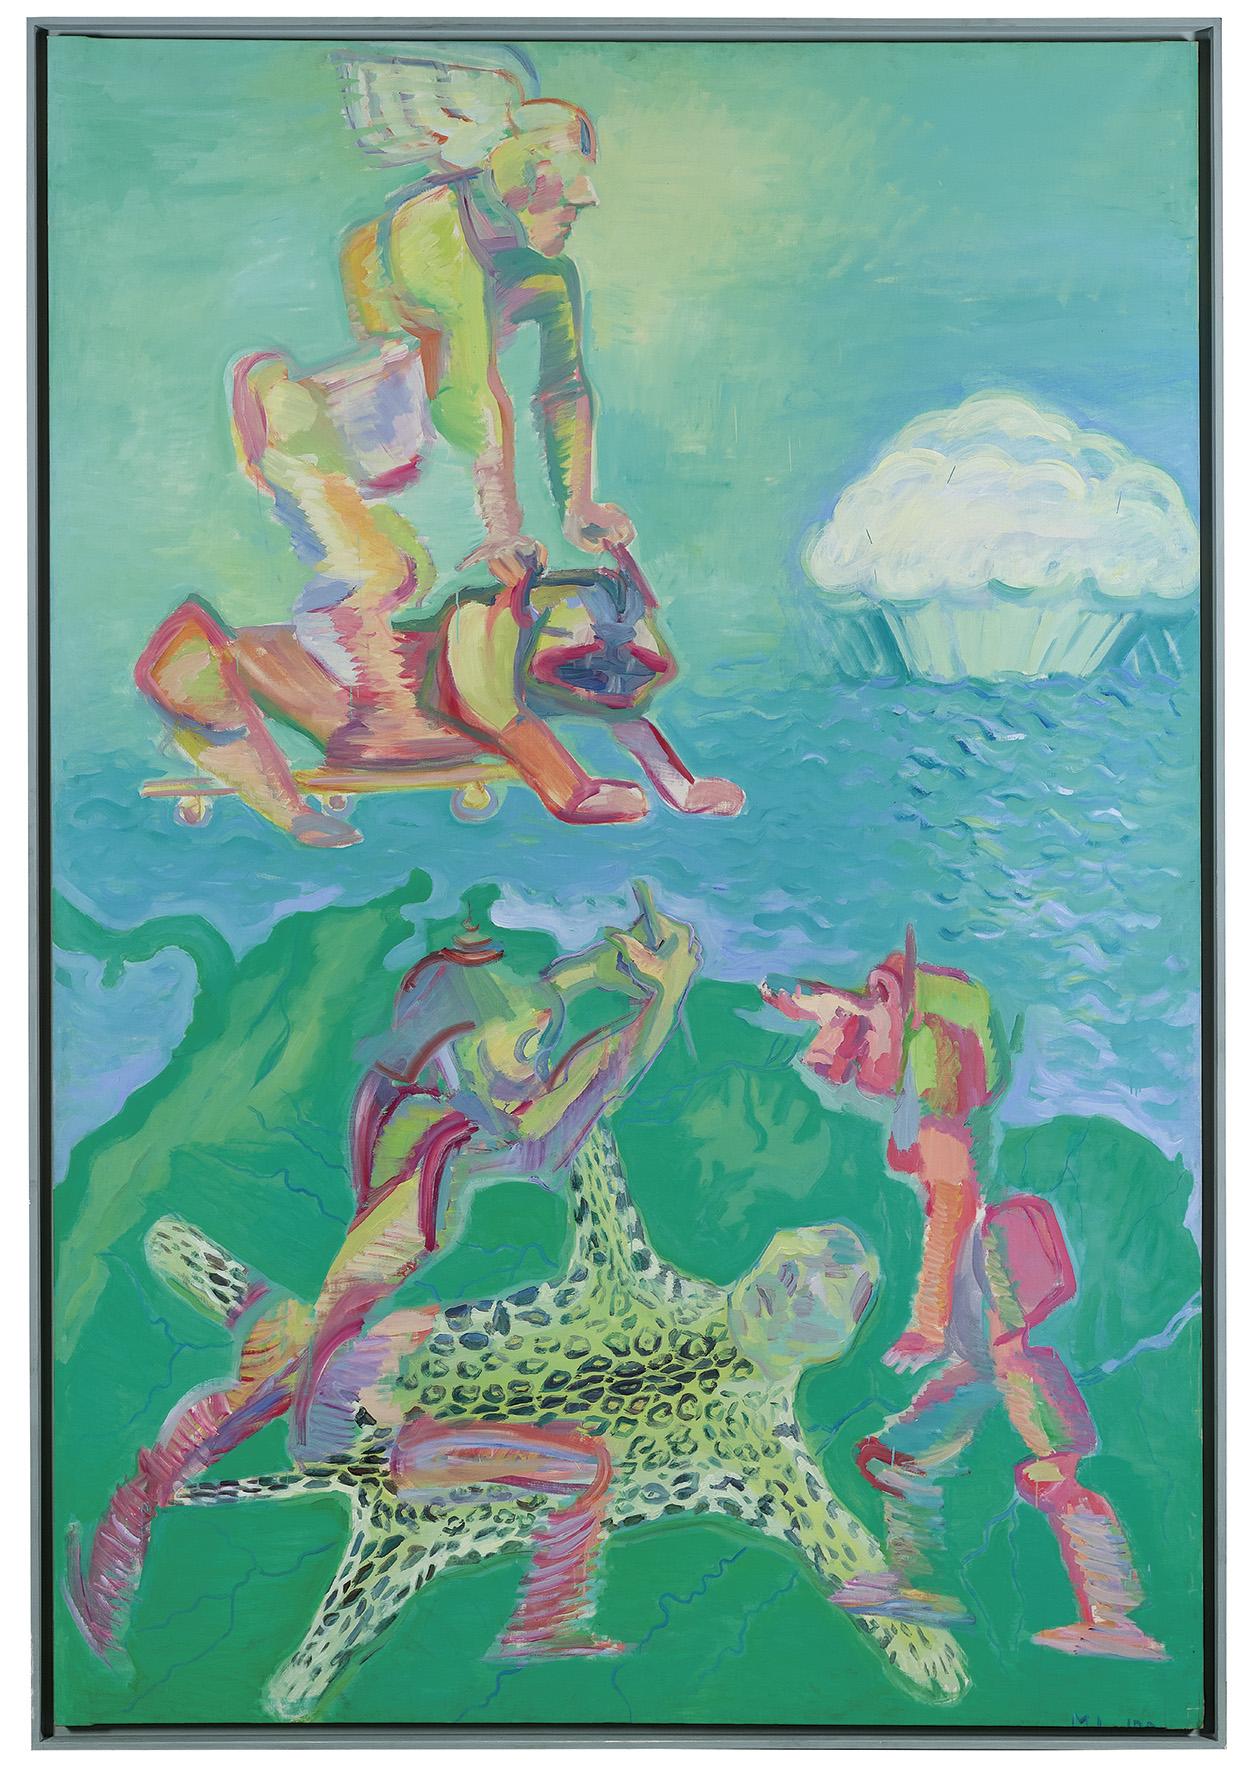 Maria Lassnig guida l'asta di arte contemporanea di Dorotheum